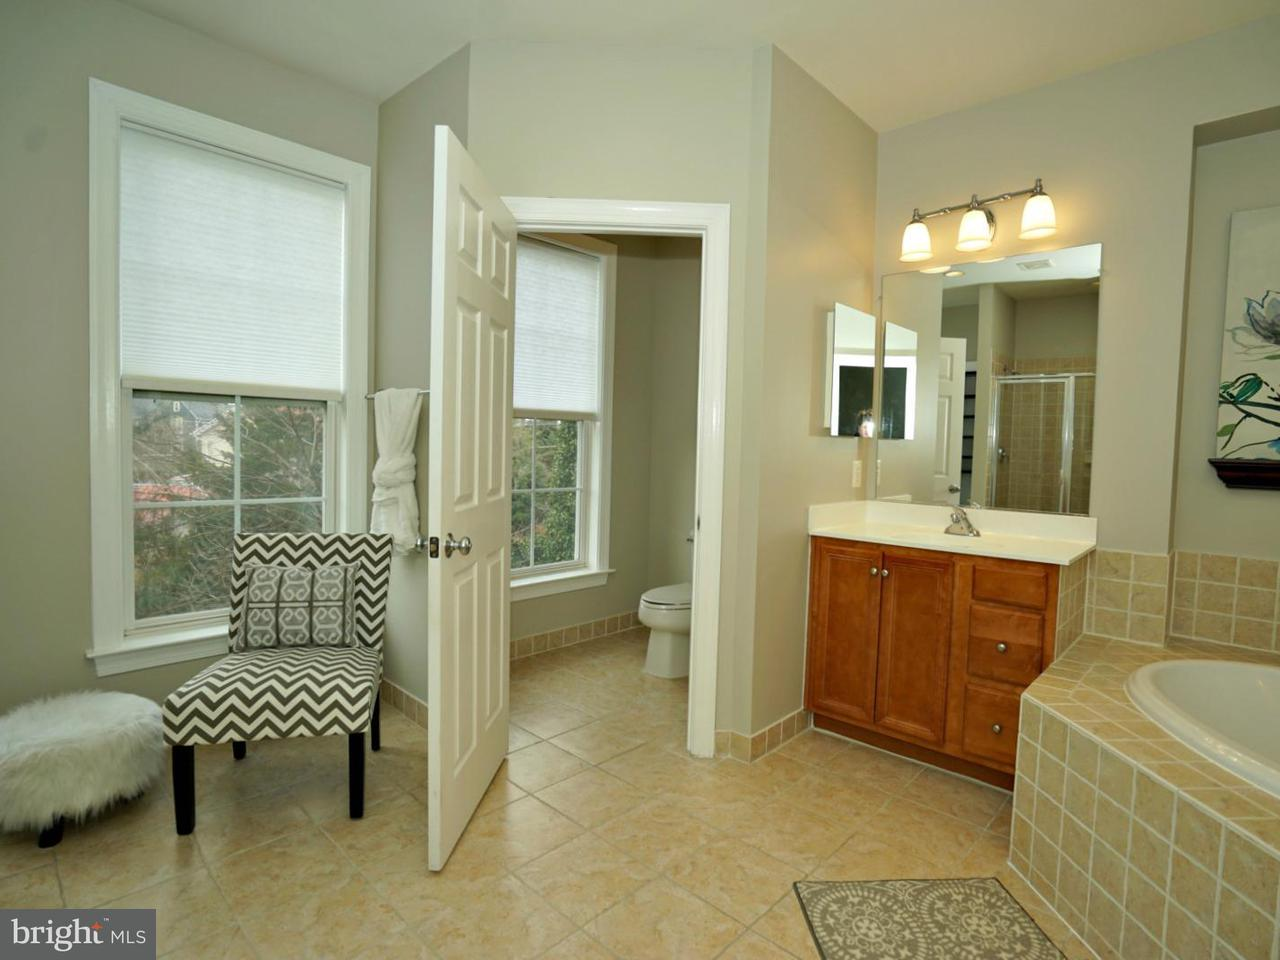 Additional photo for property listing at 232 Herndon Station Sq 232 Herndon Station Sq Herndon, Virginia 20170 Estados Unidos